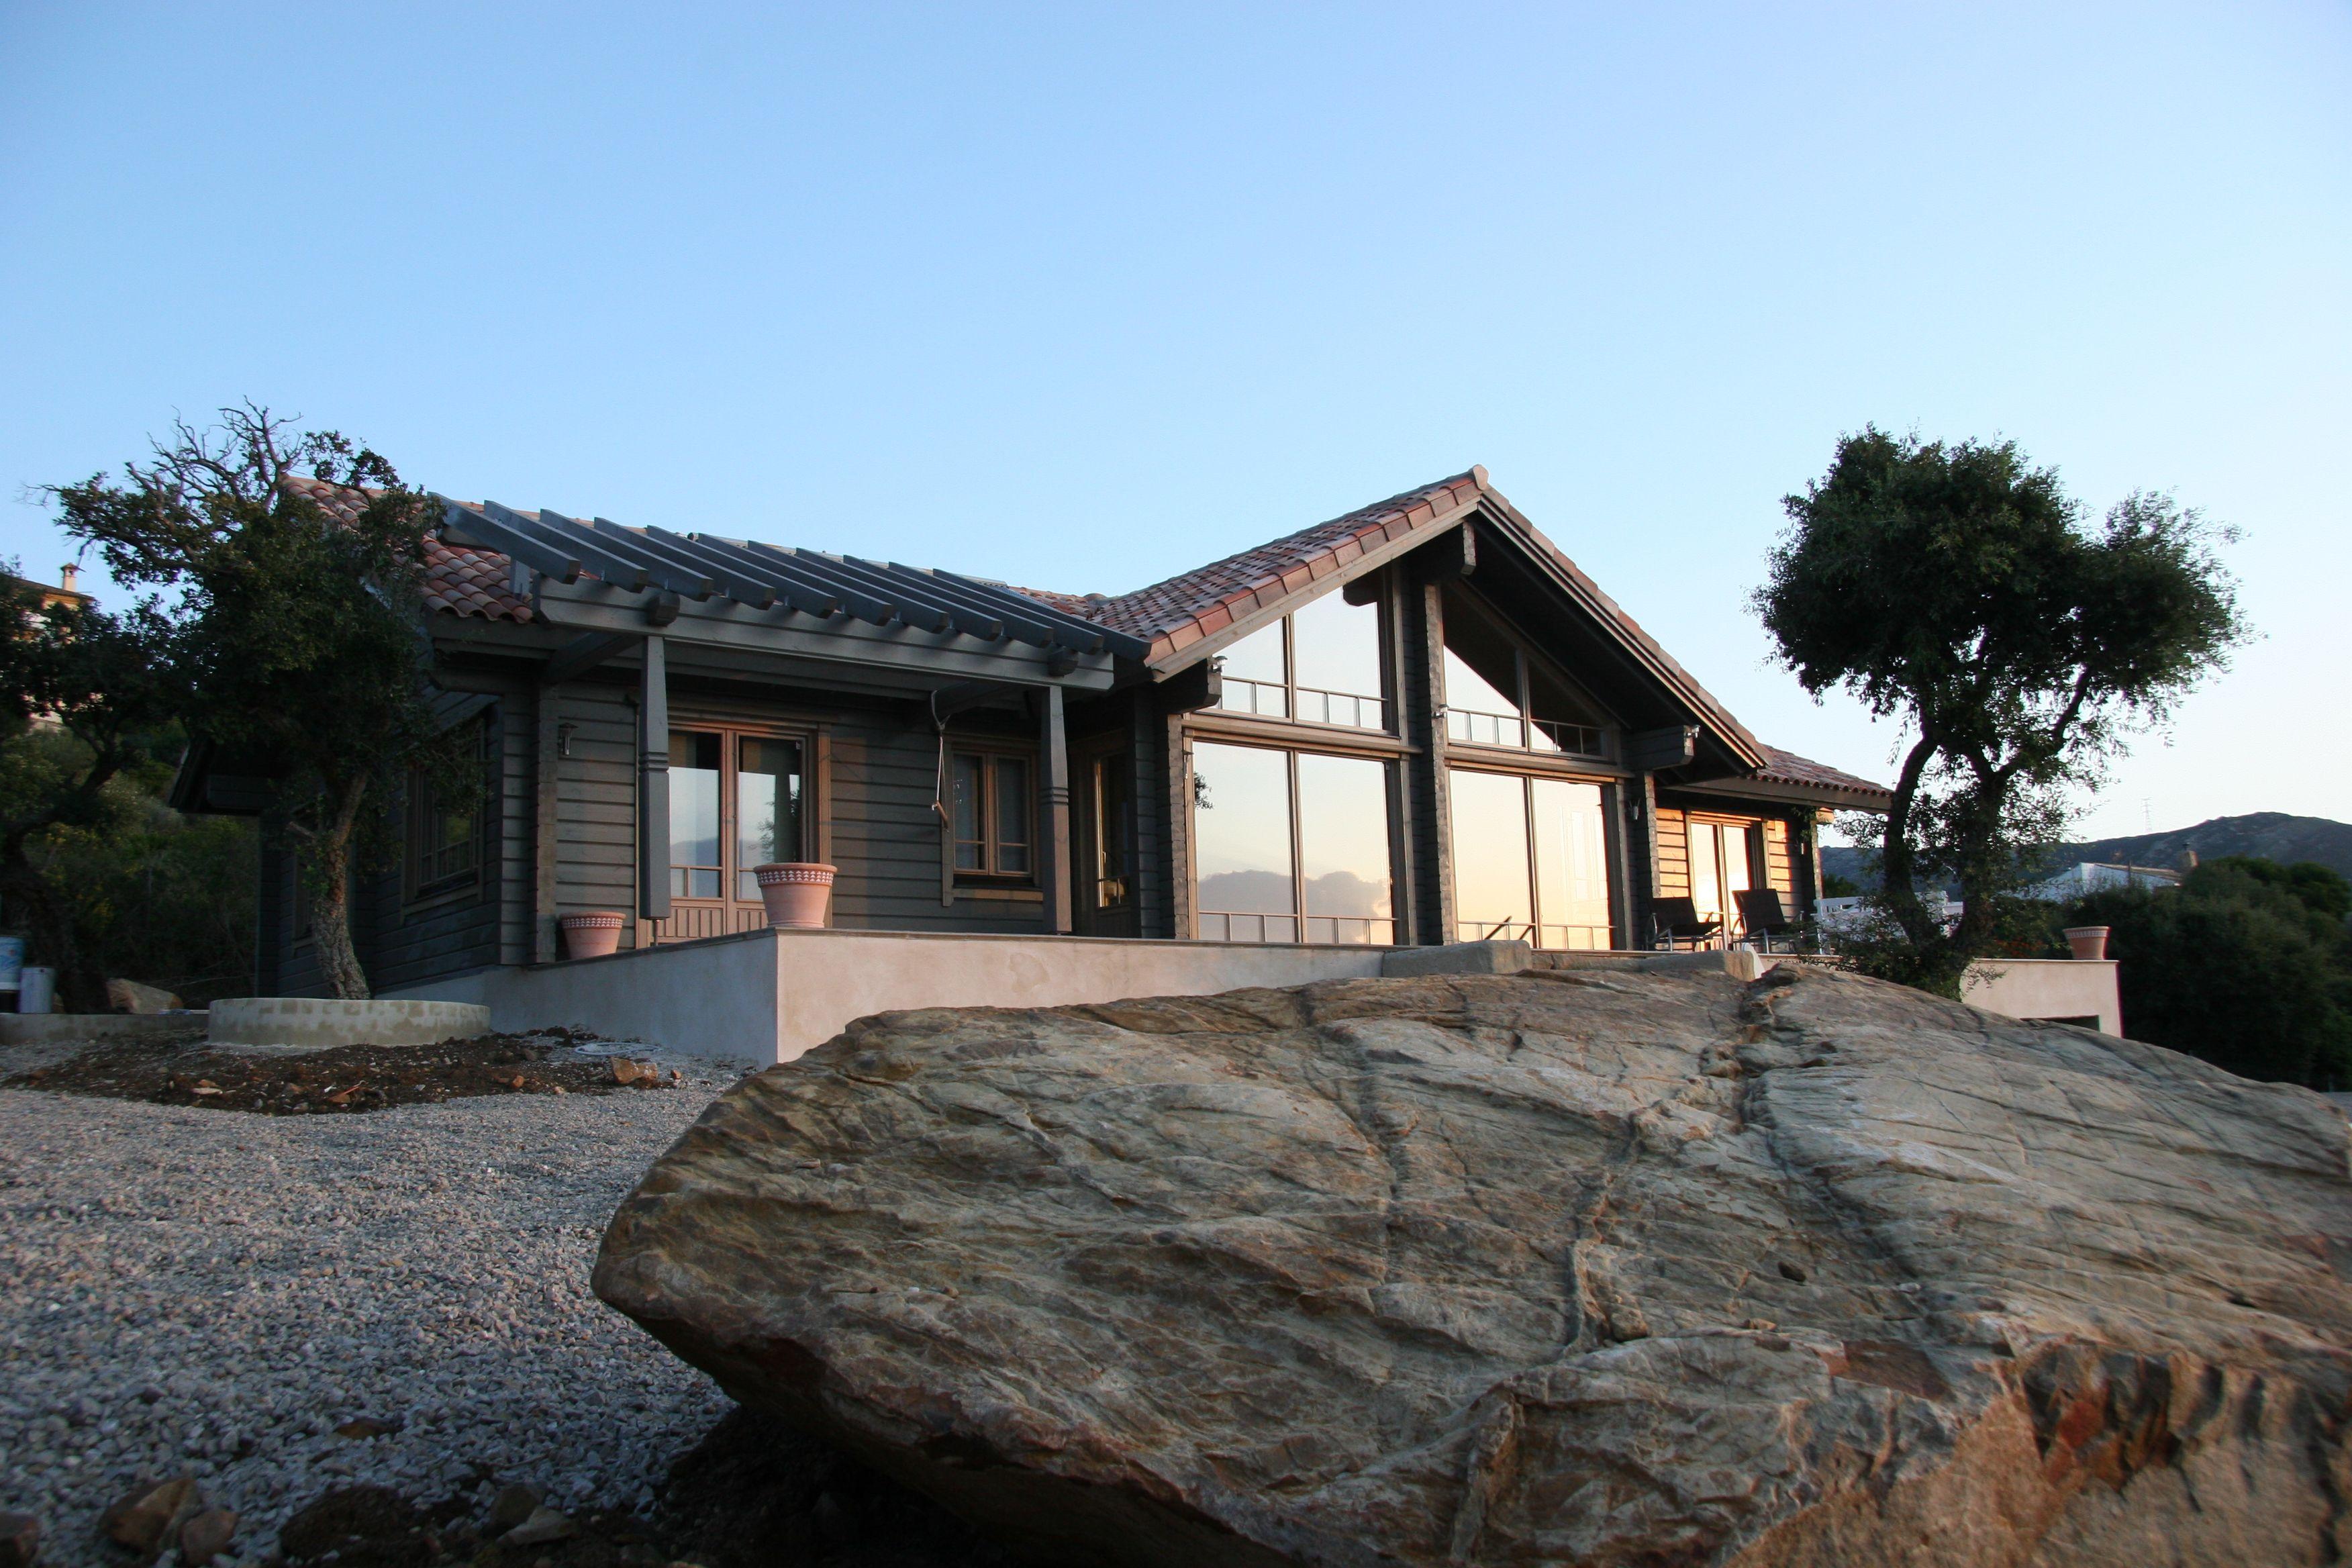 Casa honka en tarifa cadiz log house honka design pinterest logs traditional and house - Casas de madera en cadiz ...